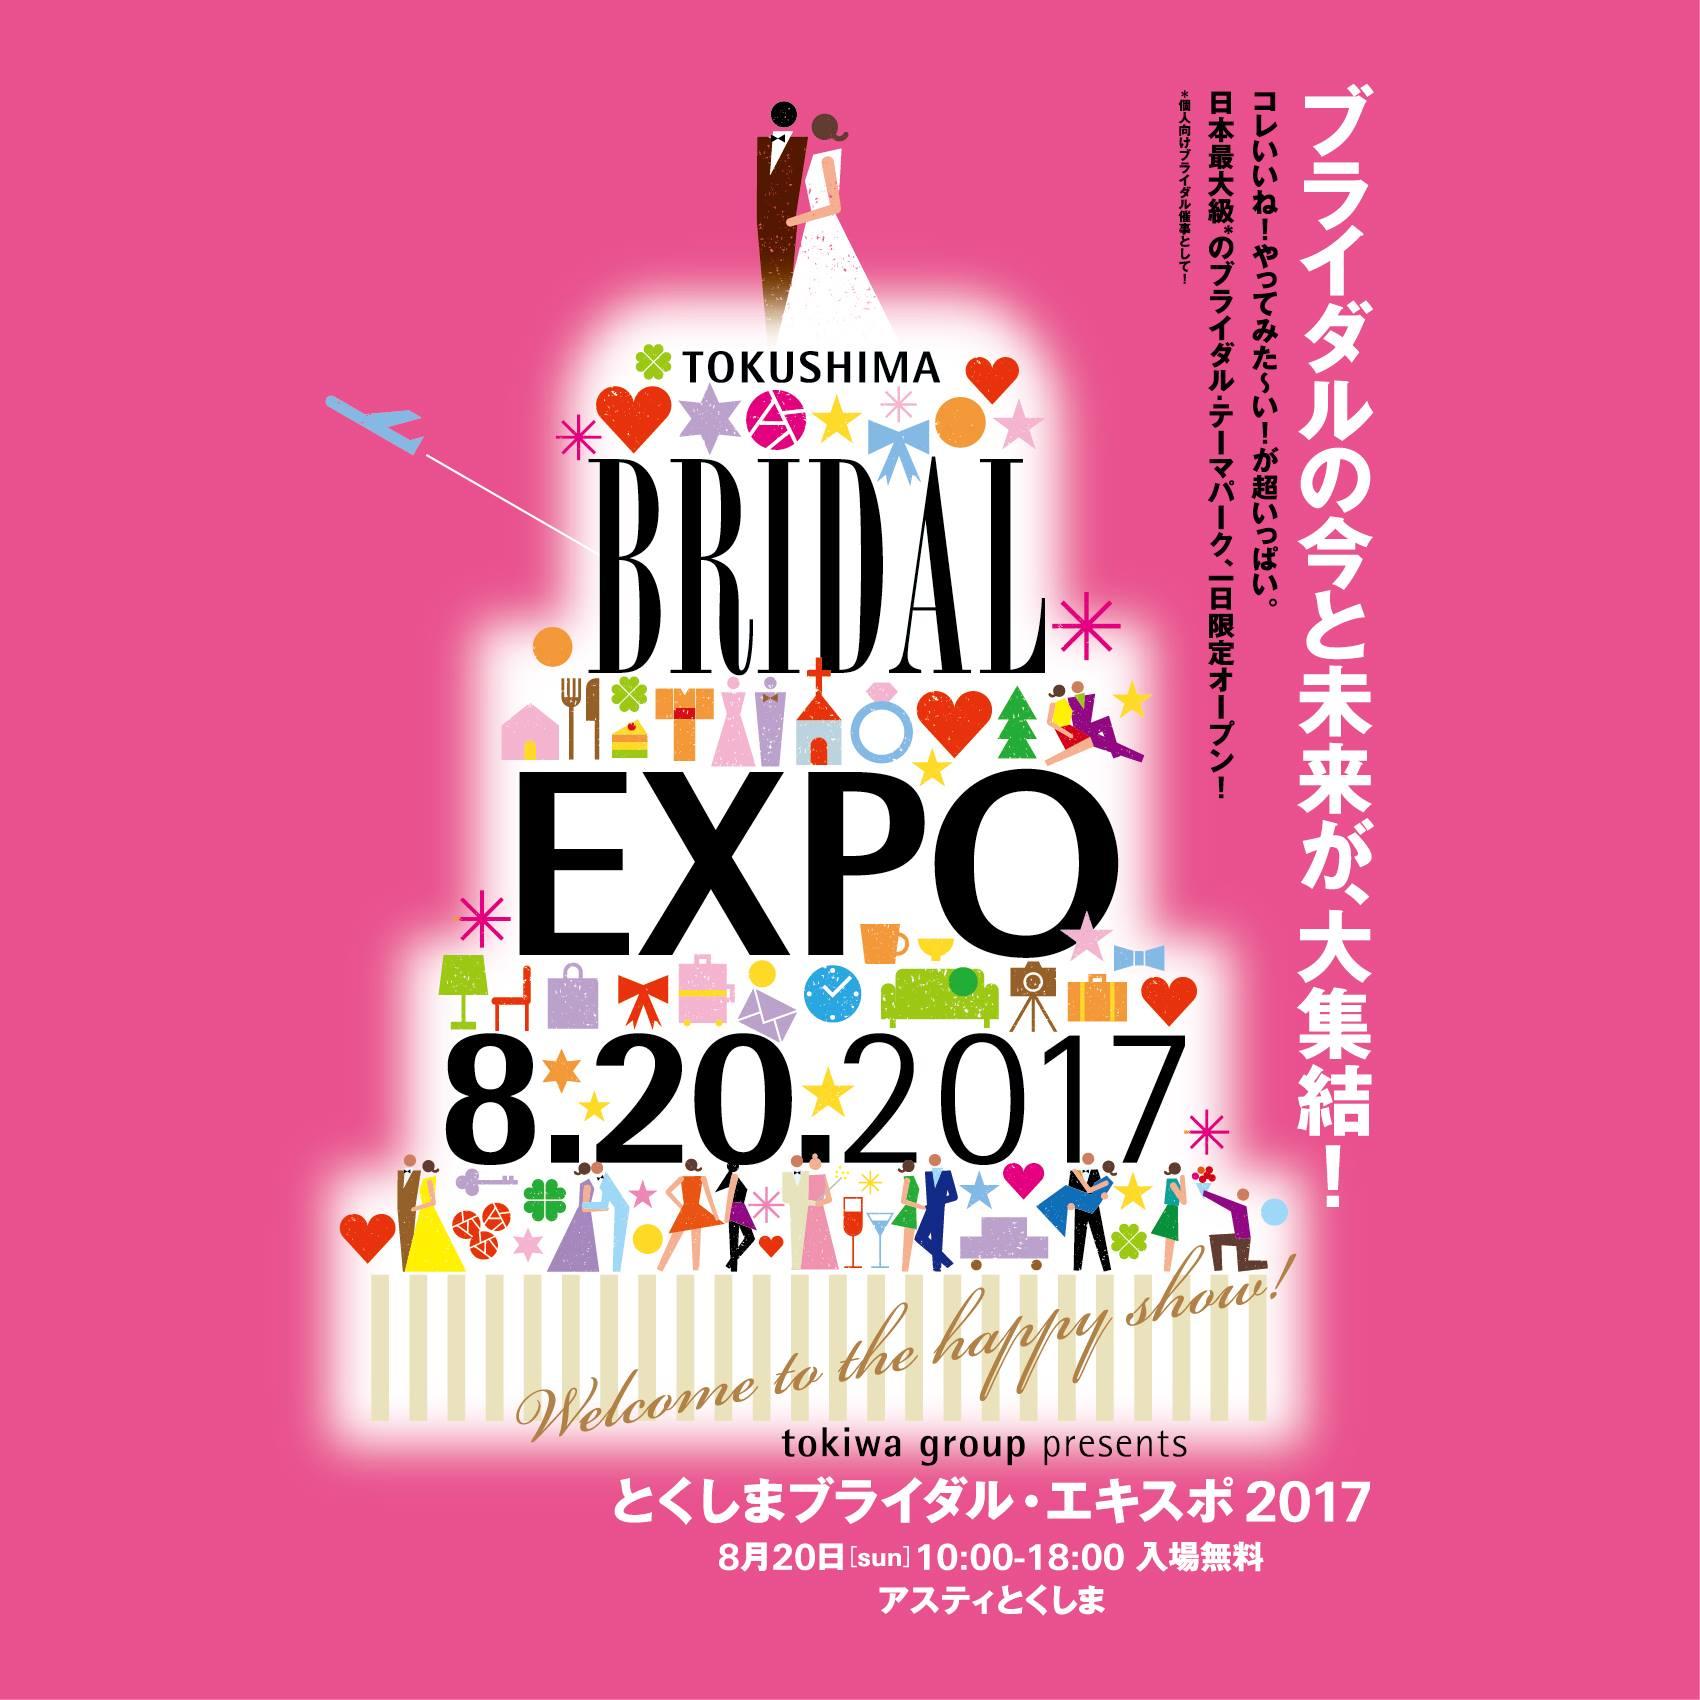 【EVENT】TOKUSHIMA BRIDAL EXPOの写真